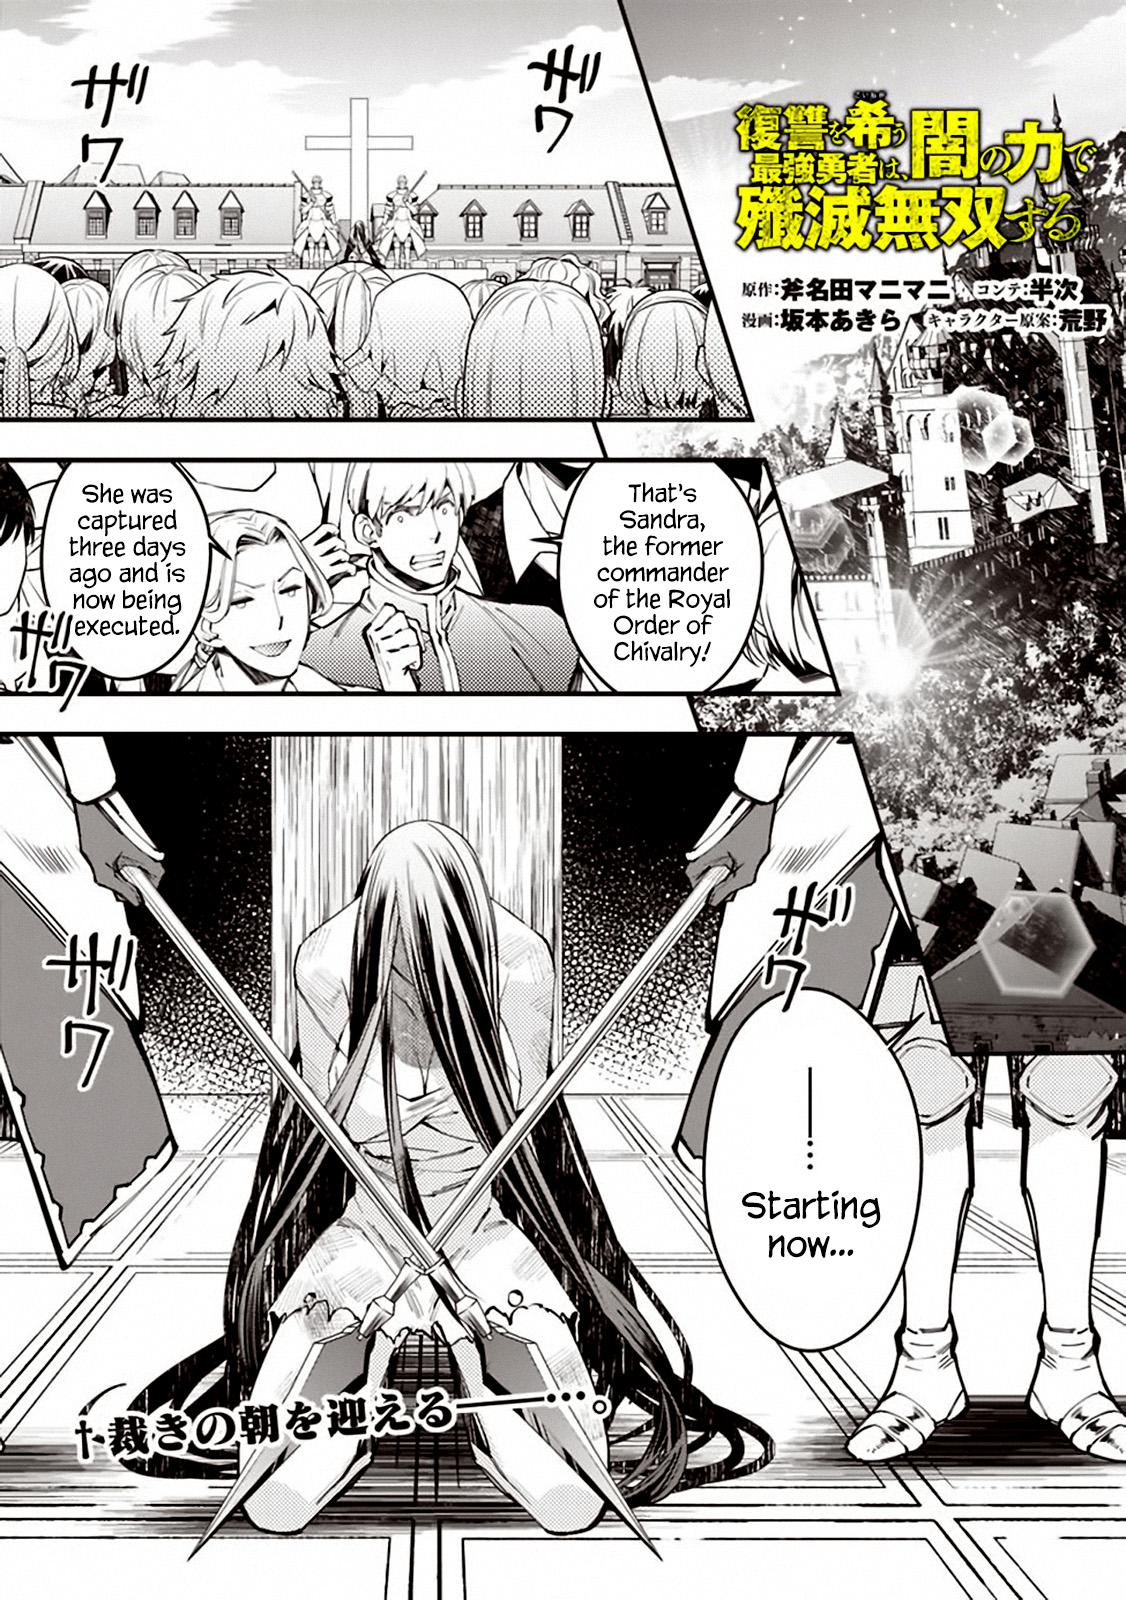 https://manga.mangadogs.com/comics/pic4/0/26176/2695687/133a2ec99e2817a4327621df3f856ca2.jpg Page 1